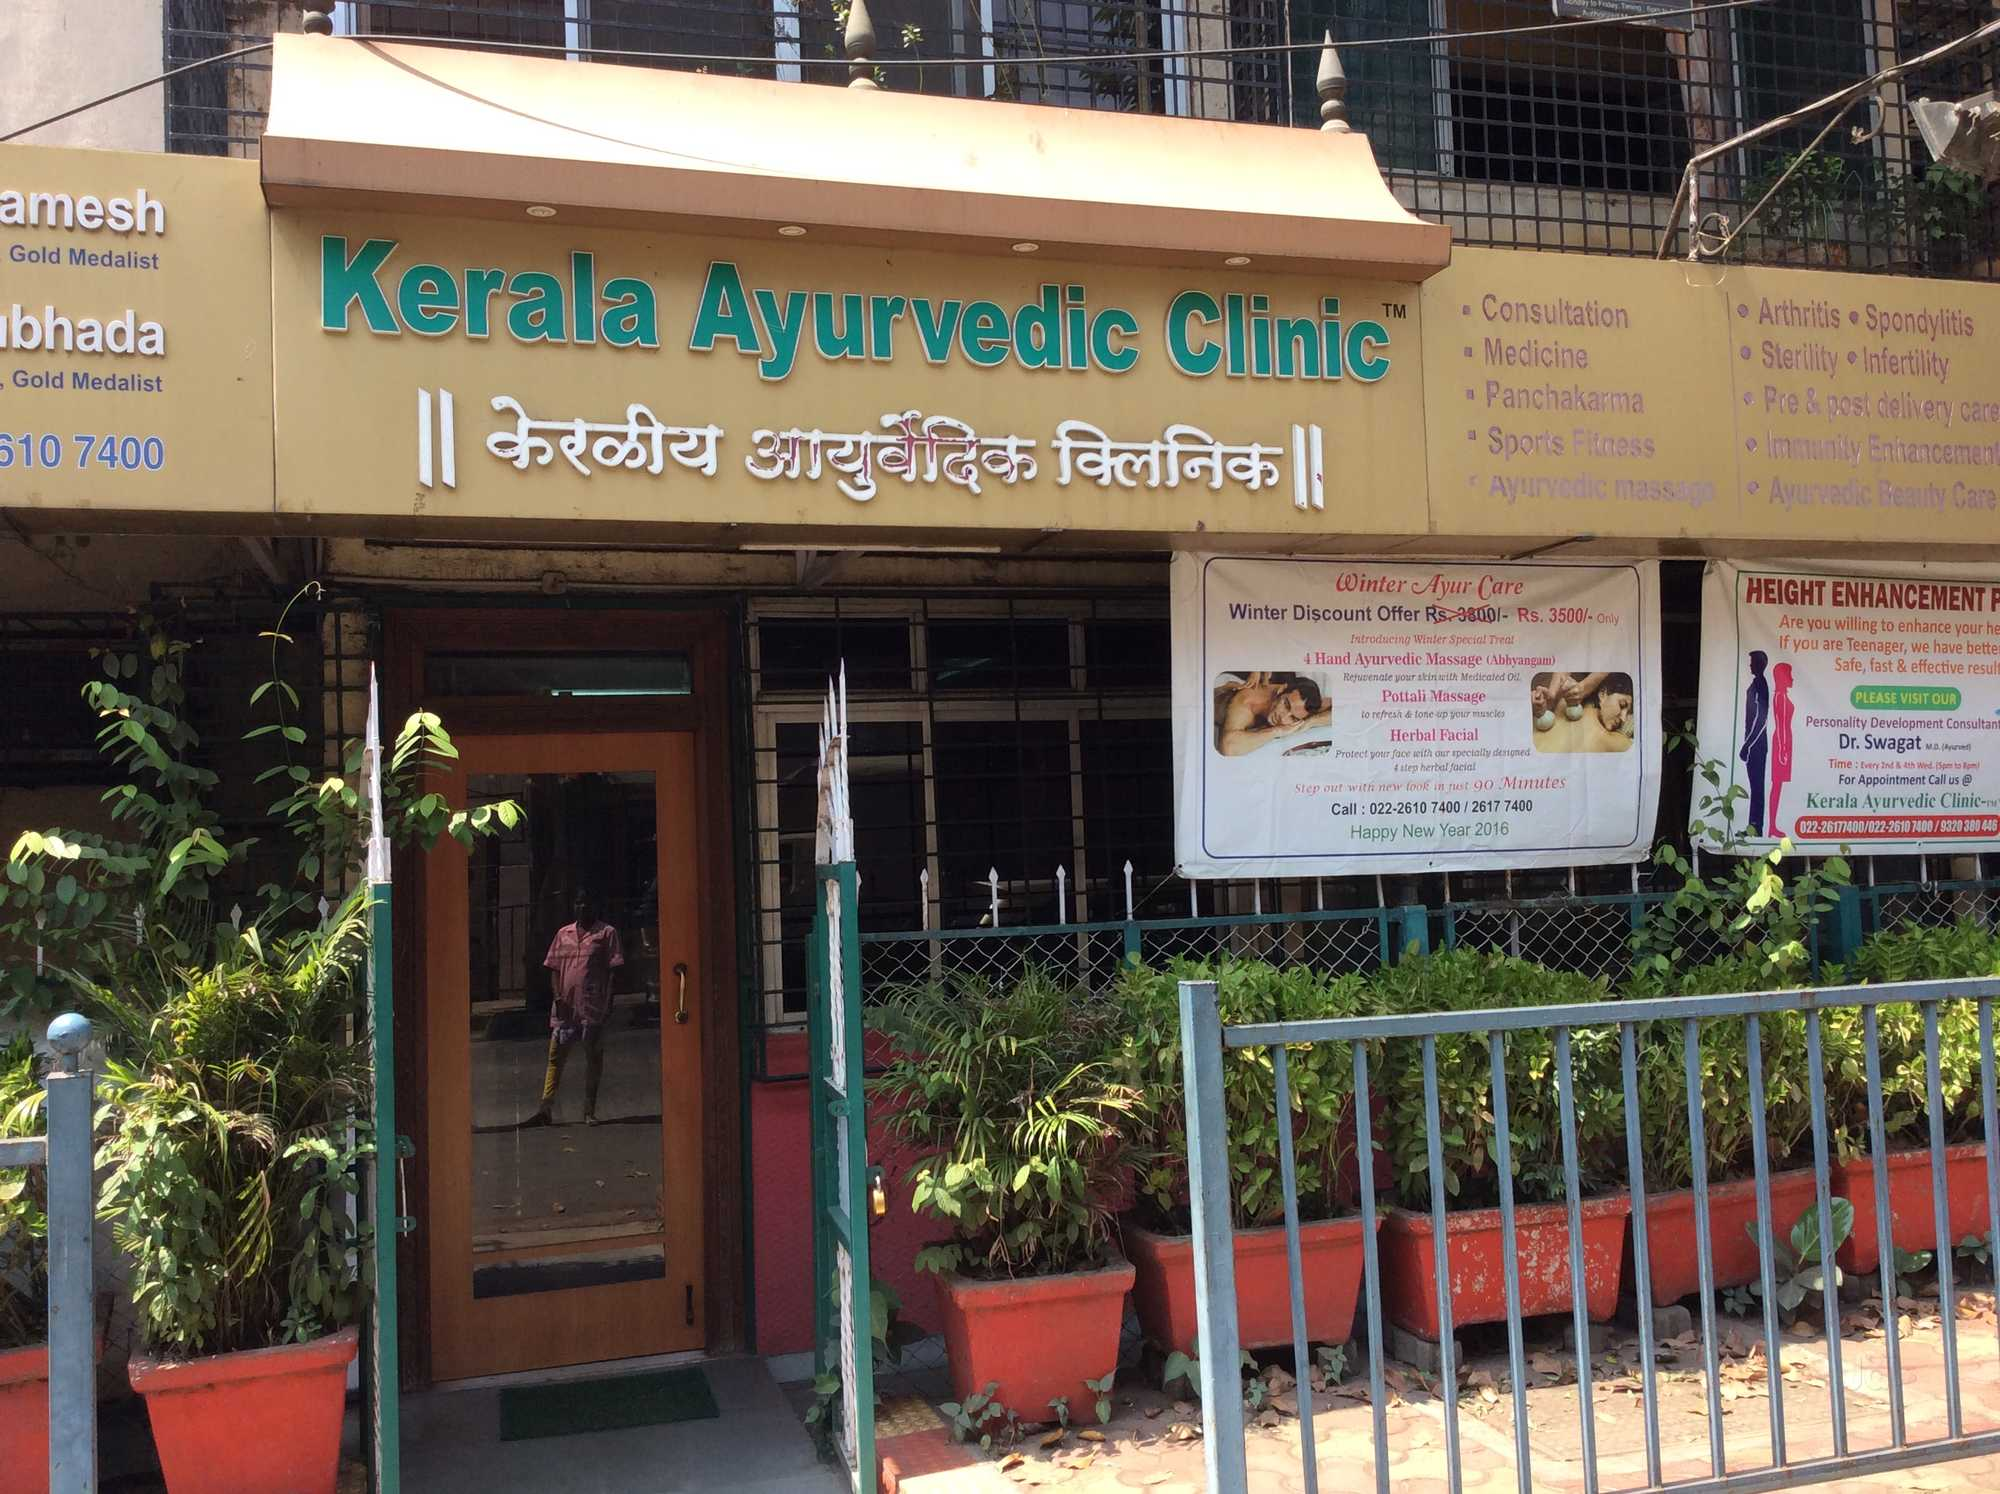 Top Skin Clinic Ayurvedic in Kasam Nagar-Andheri West